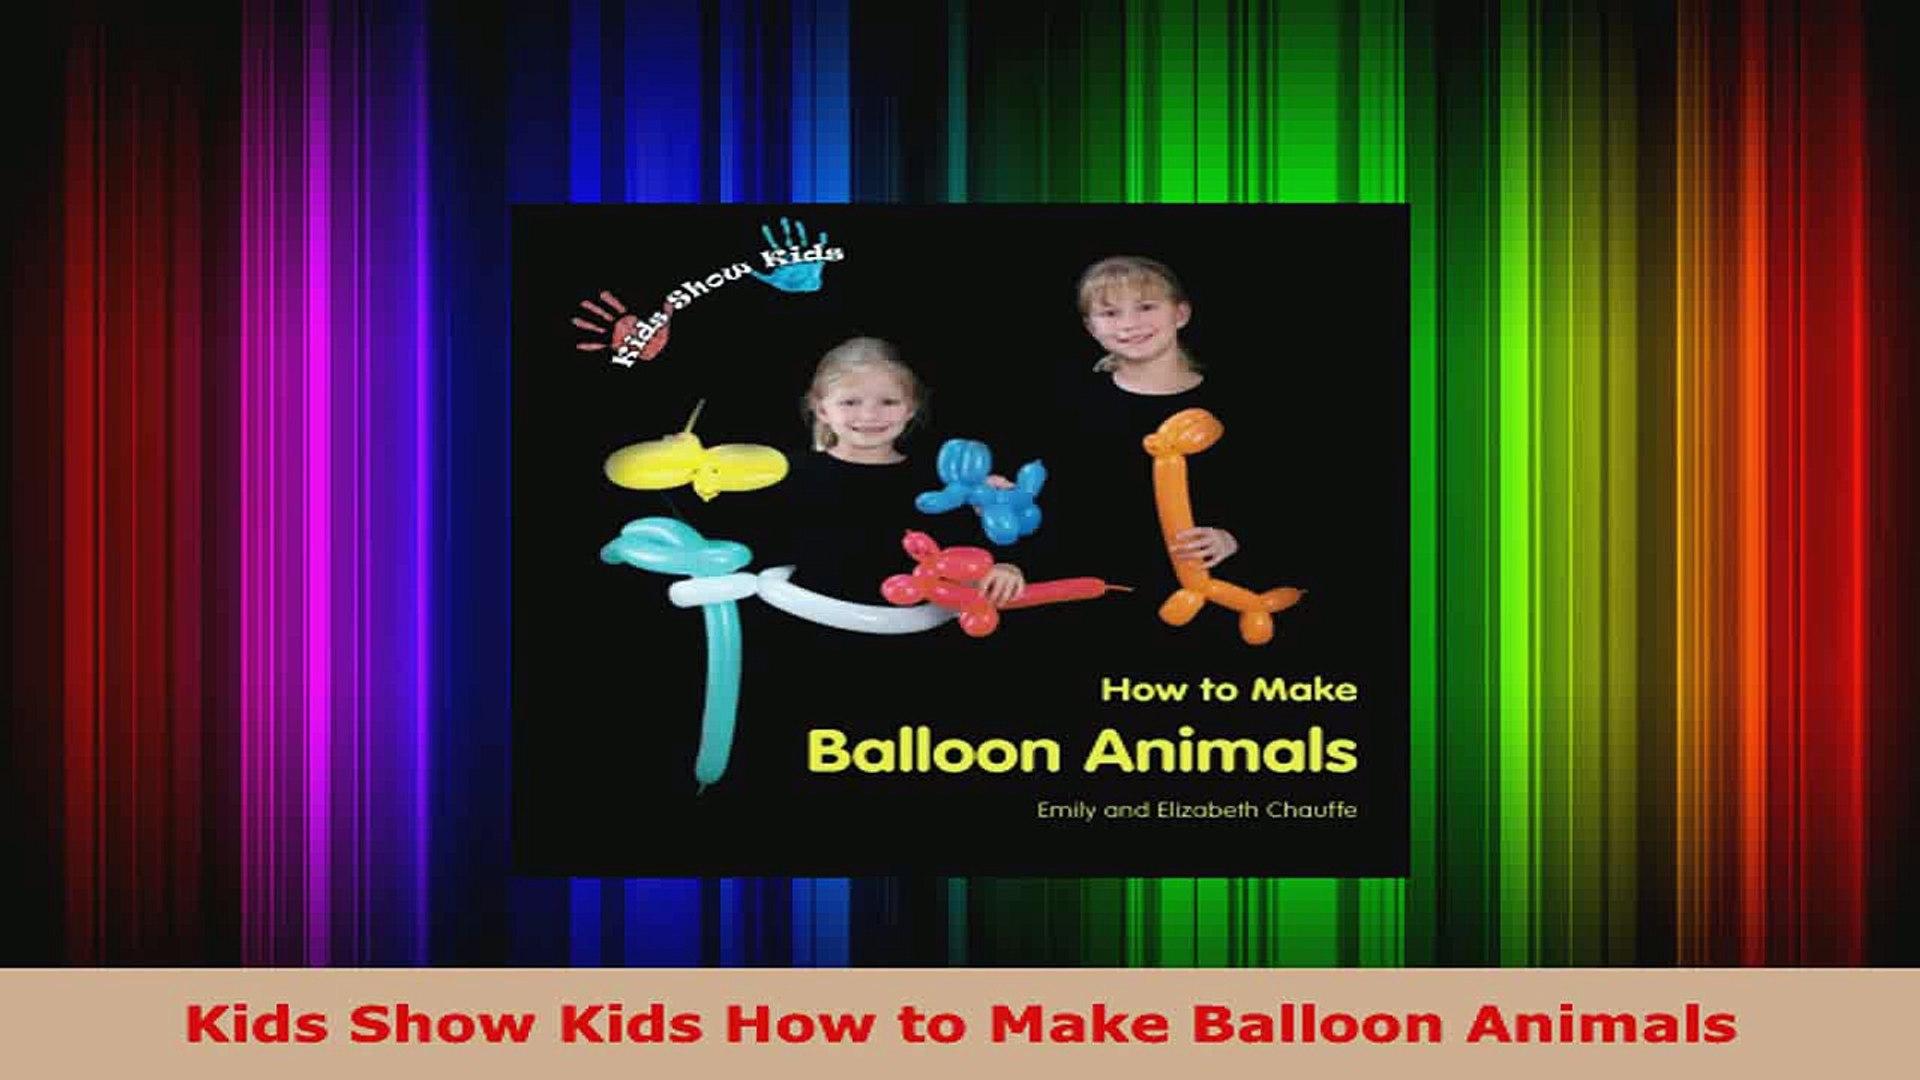 Read  Kids Show Kids How to Make Balloon Animals Ebook Free